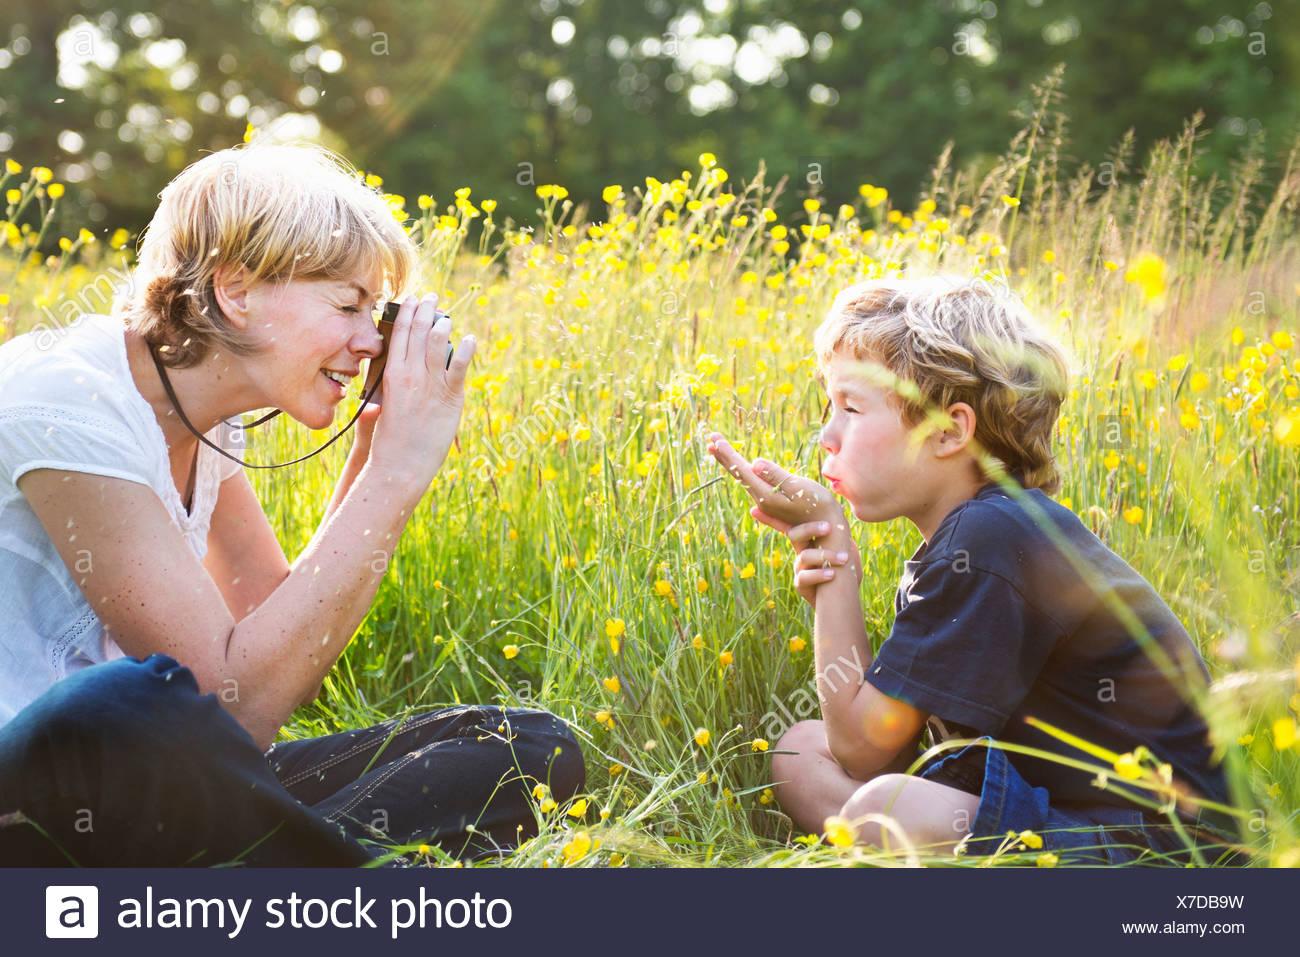 Woman taking photograph of boy blowing kiss Photo Stock